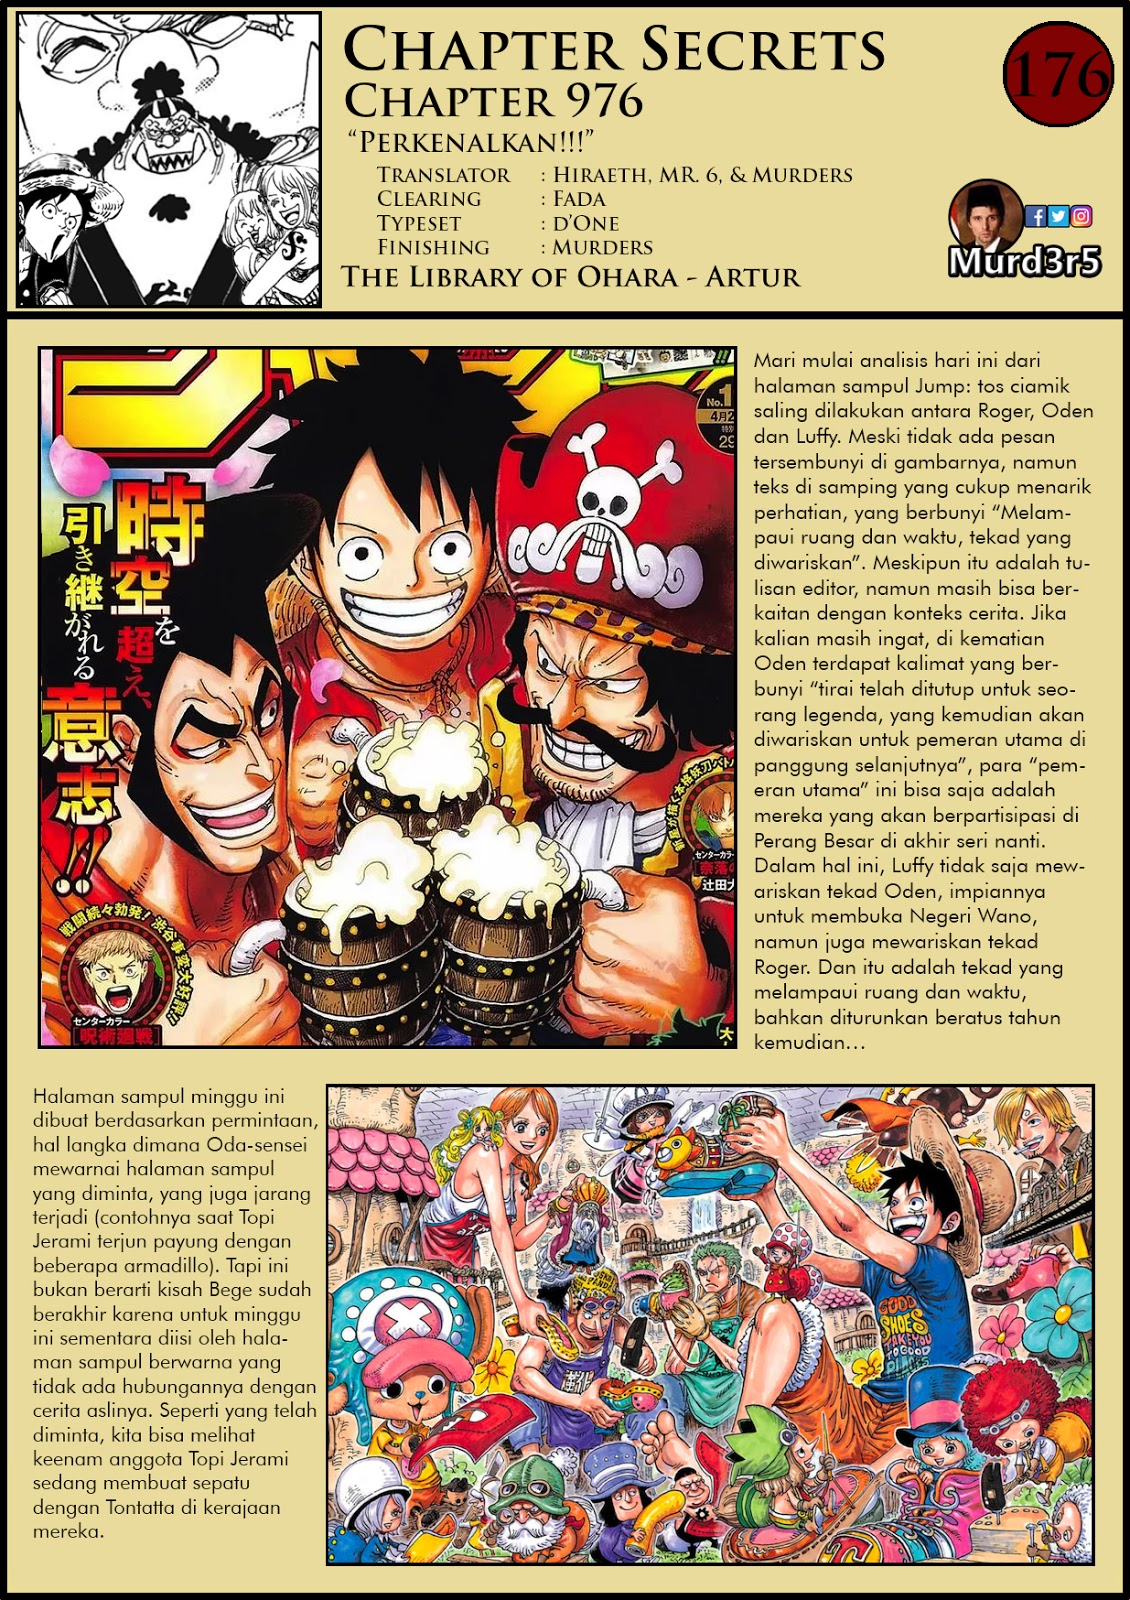 One Piece 976 Bahasa Indonesia : piece, bahasa, indonesia, Piece, Chapter, Secret, Bahasa, Indonesia, Murders, First, Murderers